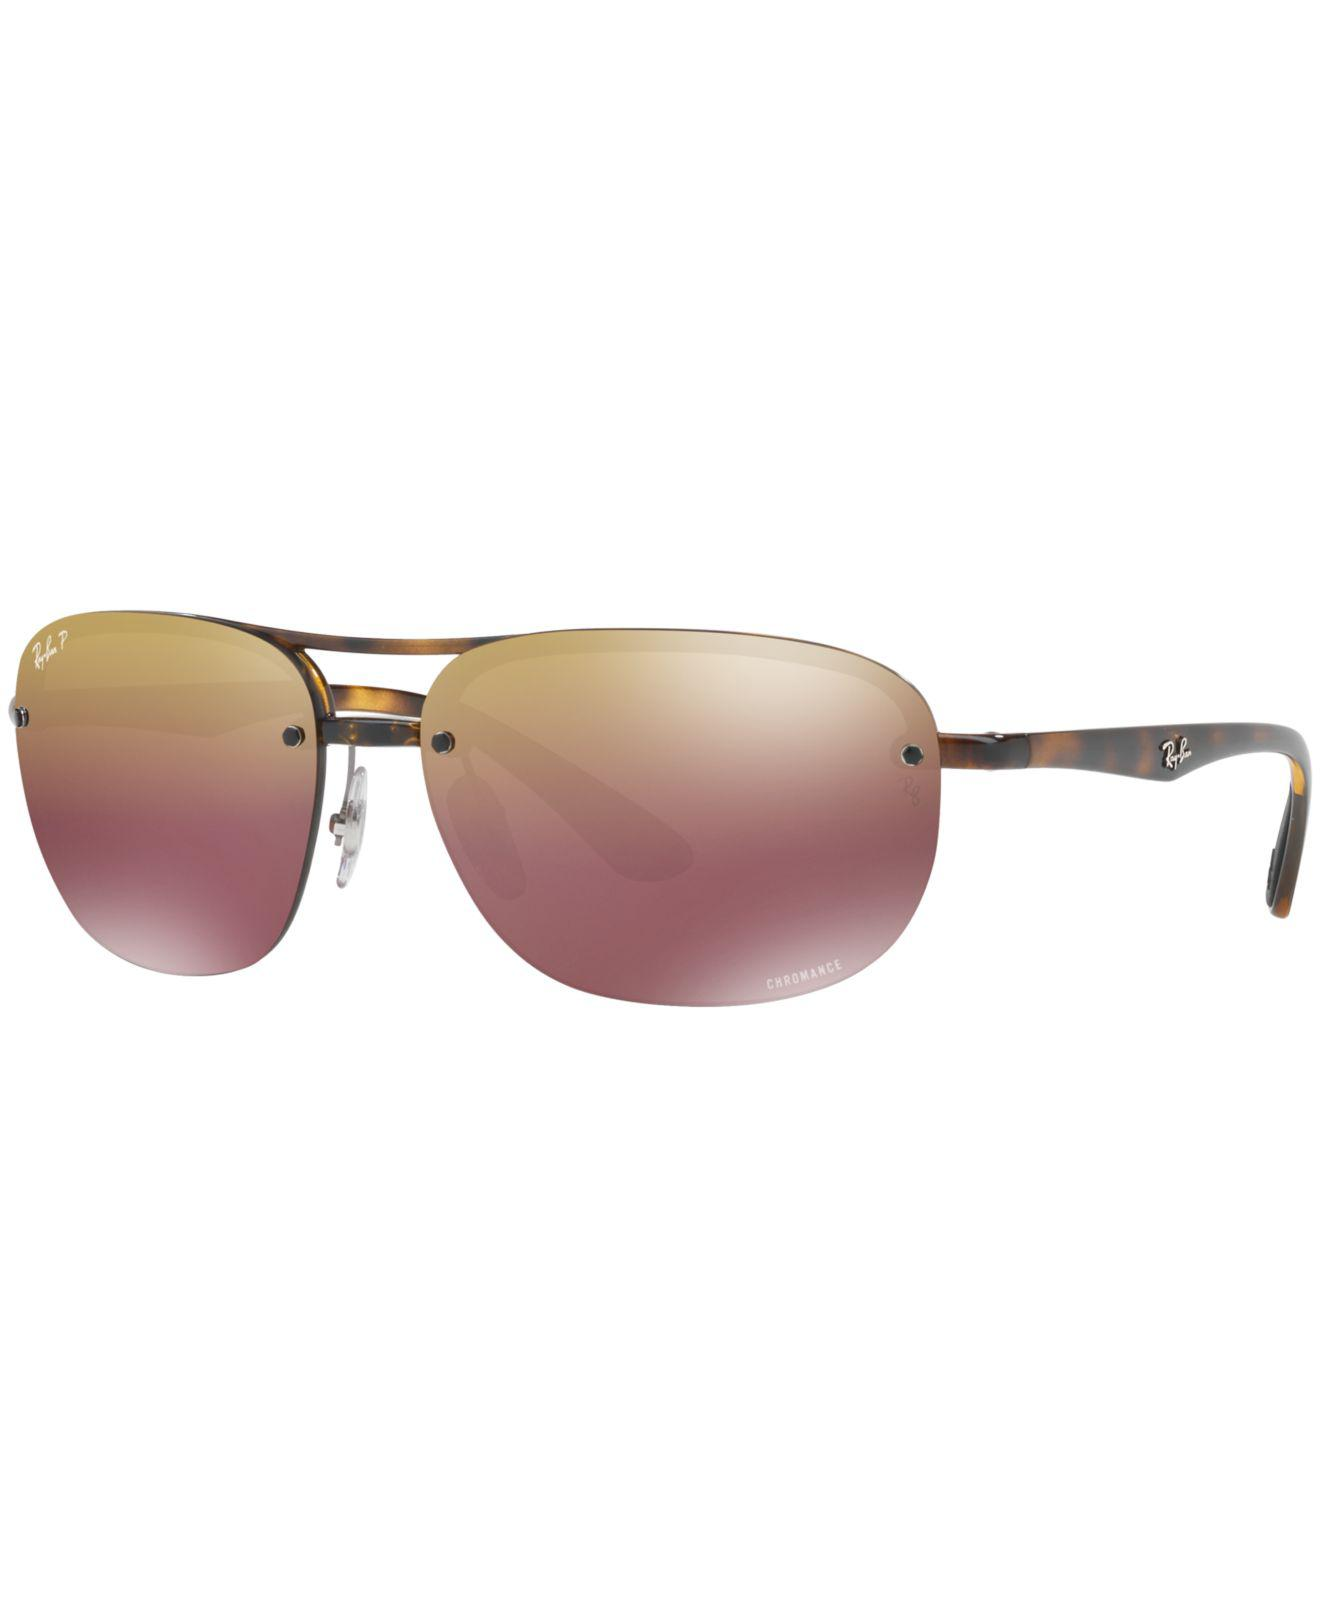 93a42812742 closeout ray ban sunglasses macys 4486e 7405e  best price lyst ray ban  polarized chromance collection sunglasses rb4275ch 81dd7 41ead